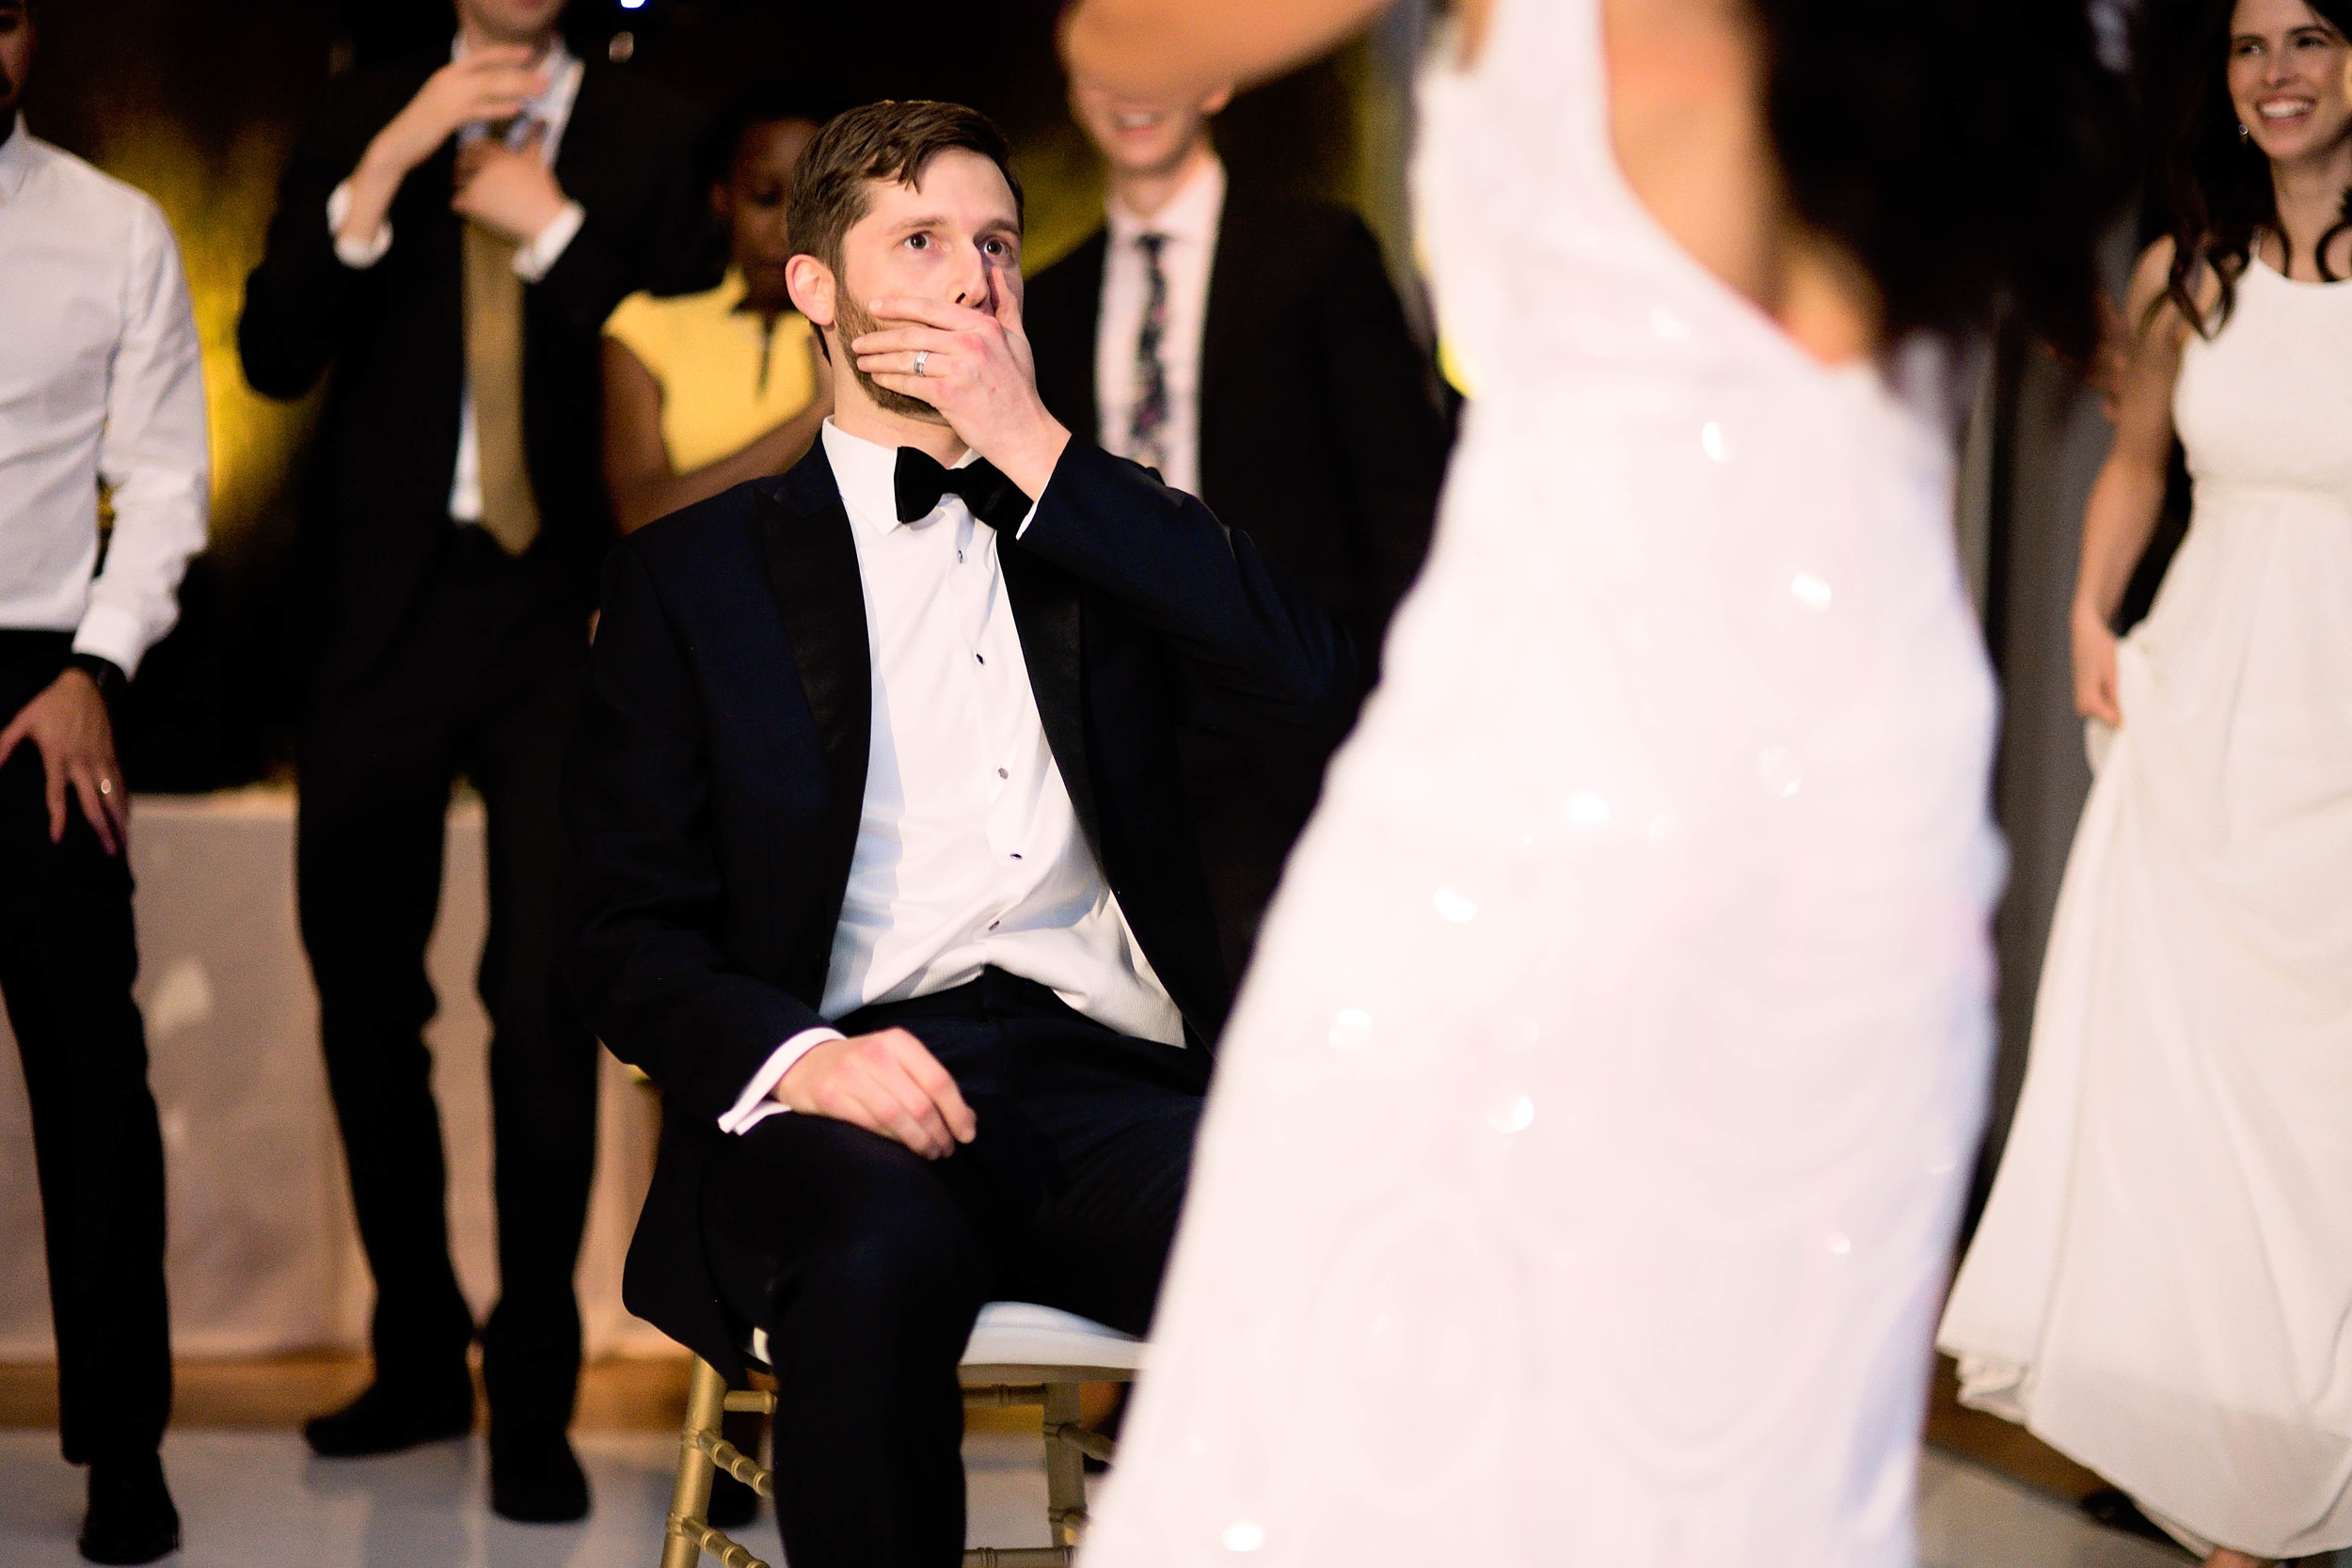 Houston Wedding- Pharris Photography- Reception- Natalie + Mark- Dance Floor